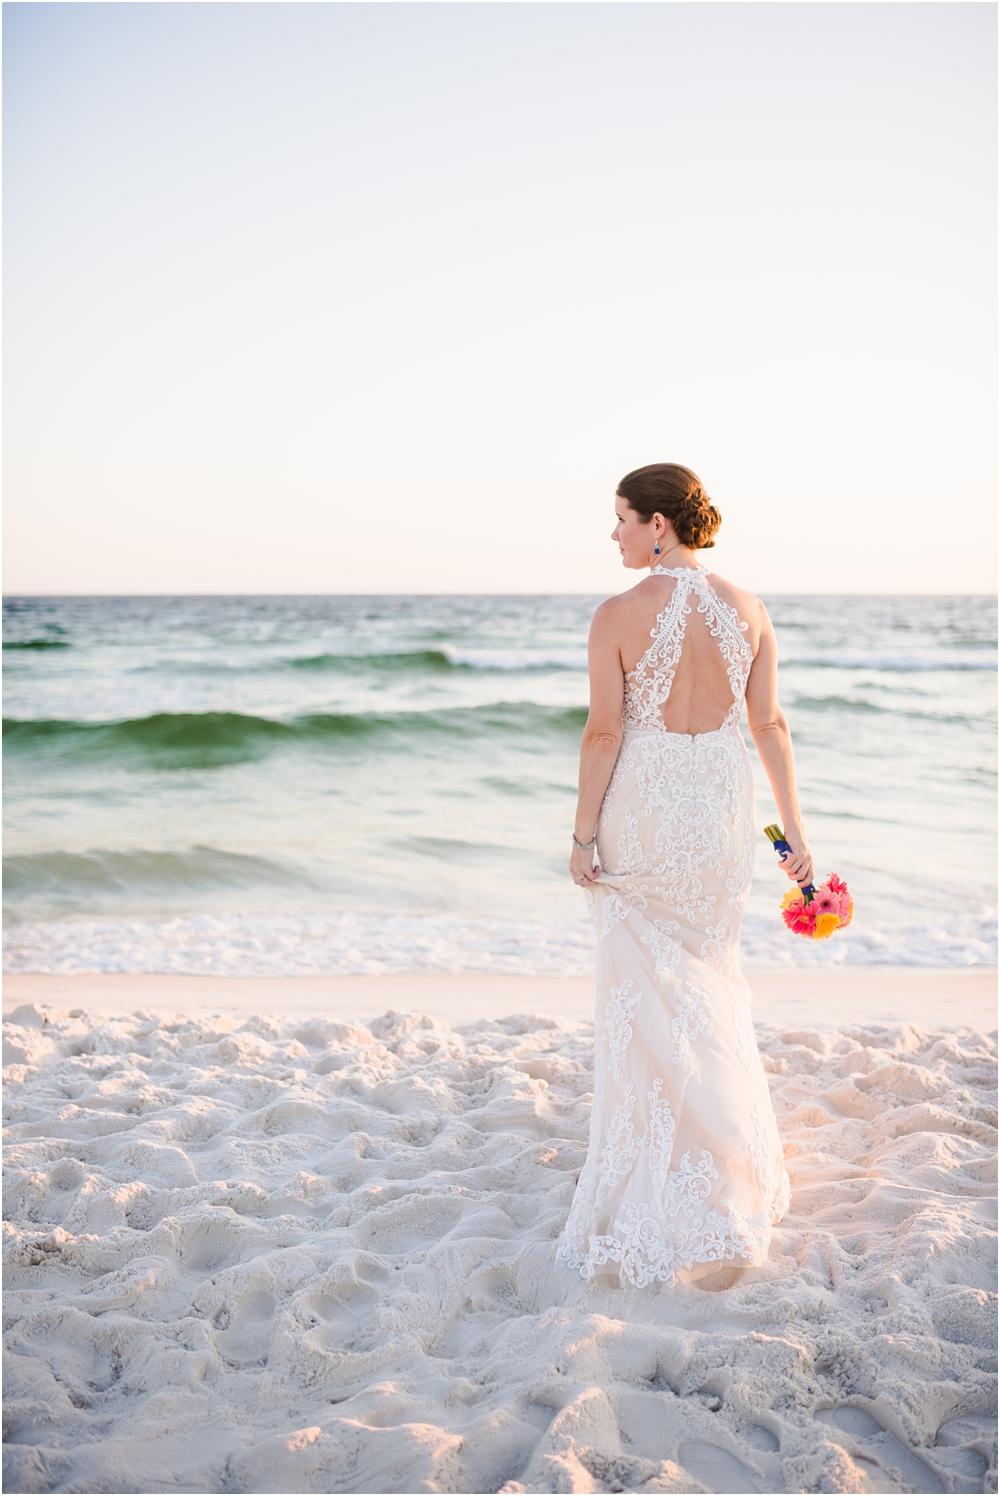 ledman-wedding-kiersten-stevenson-photography-30a-panama-city-beach-dothan-tallahassee-(488-of-763).JPG